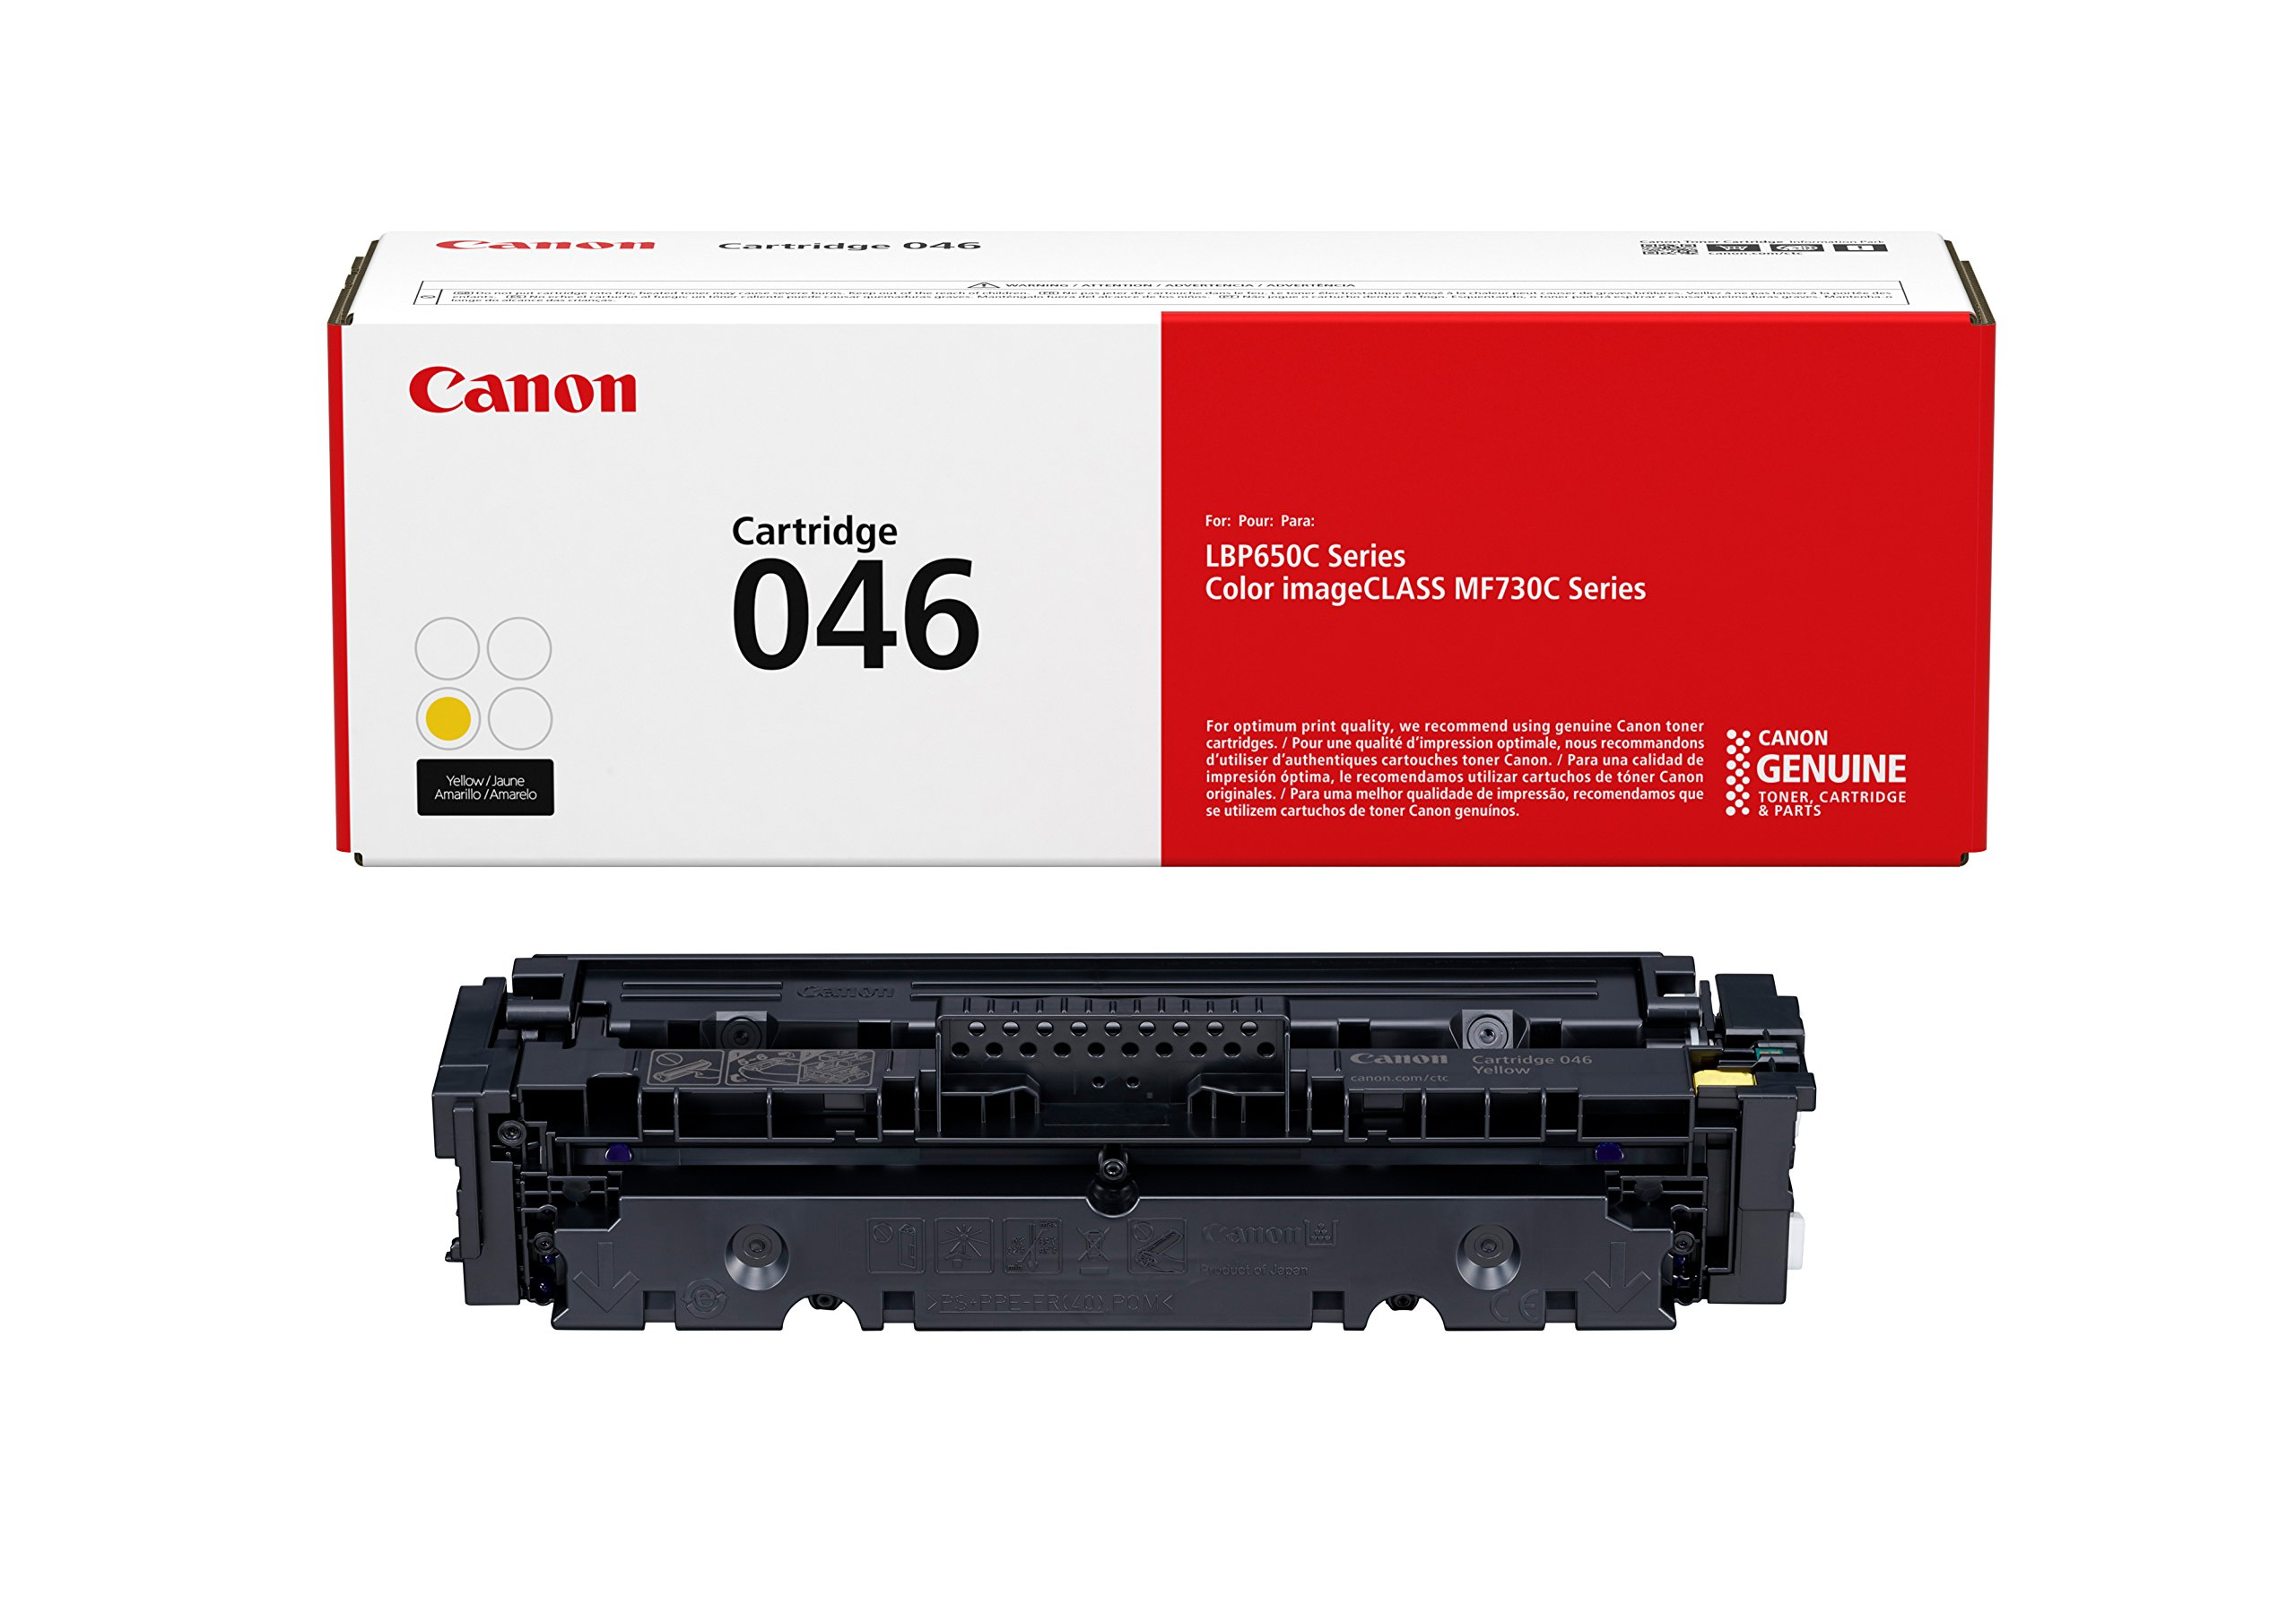 Canon Genuine Toner, Cartridge 046 Yellow (1247C001), 1 Pack, for Canon Color imageCLASS MF735Cdw, MF733Cdw, MF731Cdw, LBP654Cdw Laser Printers